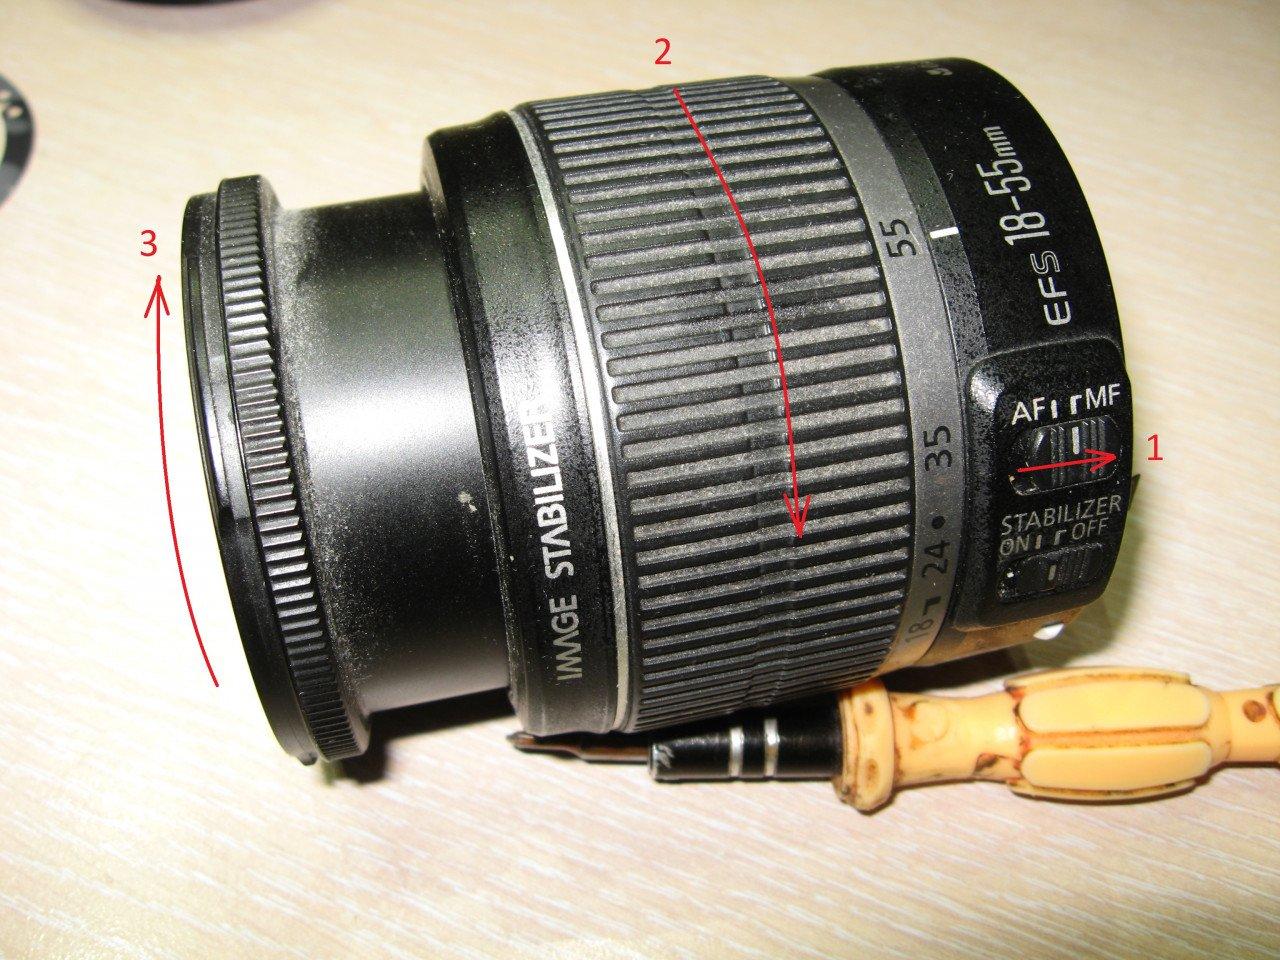 Паяльник SEQURE SQ-D60 с жалом T12 и USB-C. Ремонт объектива Canon EF-S 18-55 mm в условиях ядерного апокалипсиса